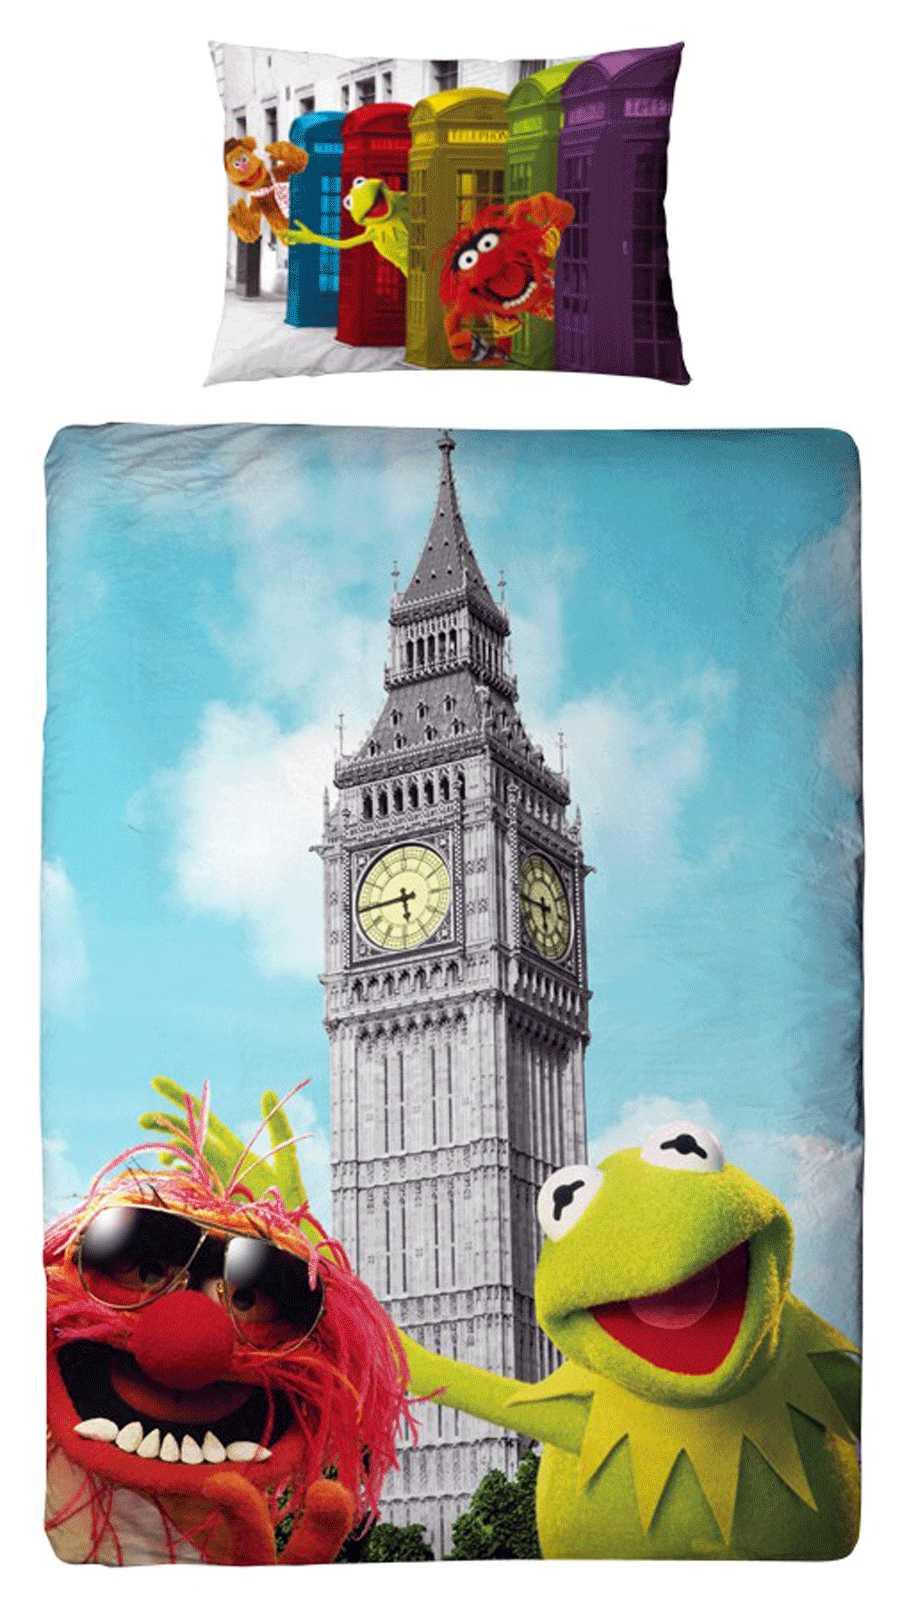 Childrens-Characters-Single-Bed-Quilt-Duvet-Cover-amp-Pillowcase-Kids-Bedding-Set thumbnail 151